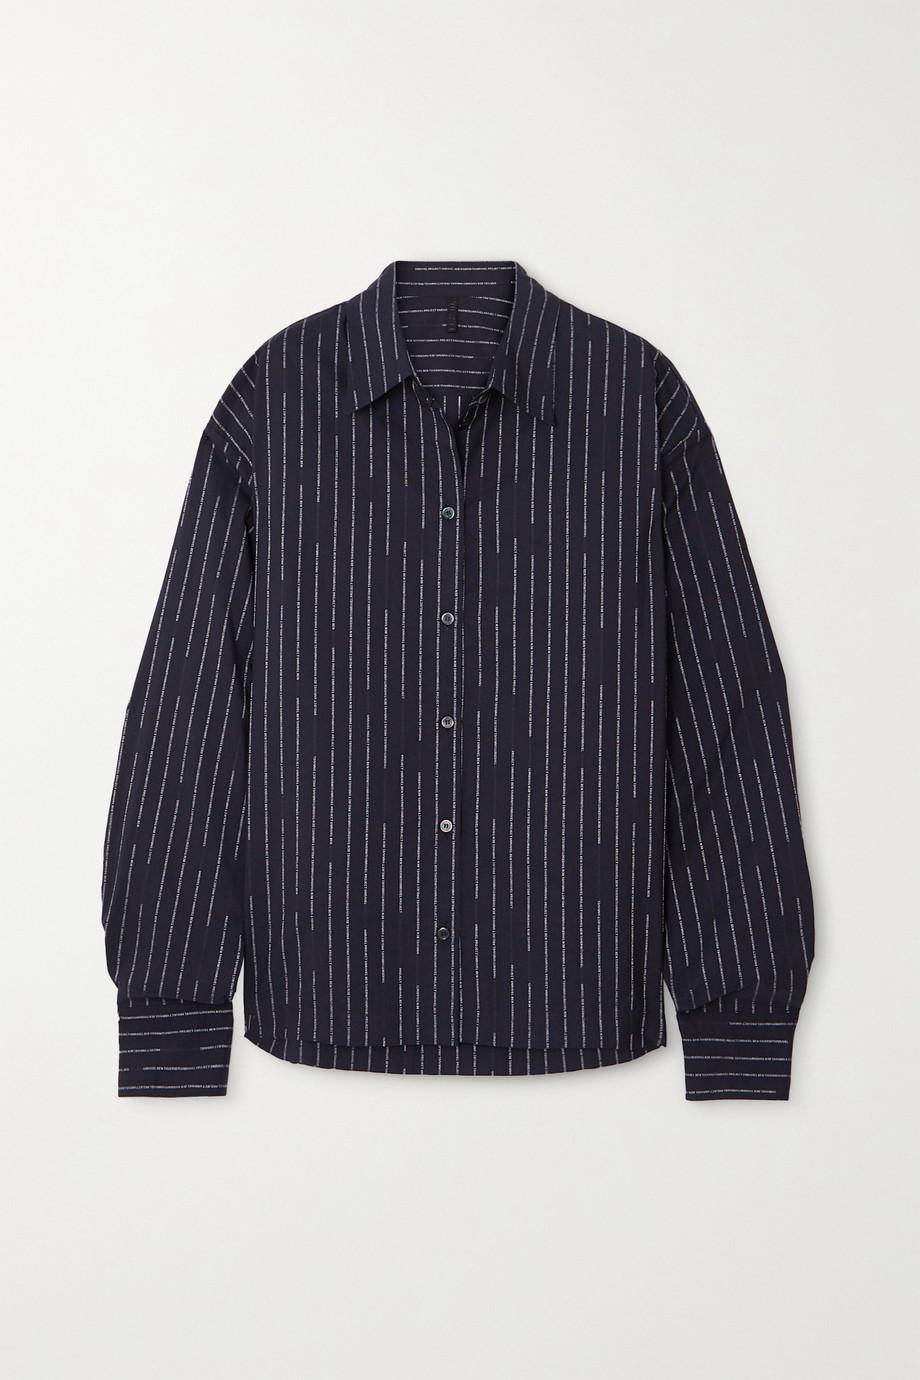 Unravel Project Striped cotton-poplin shirt